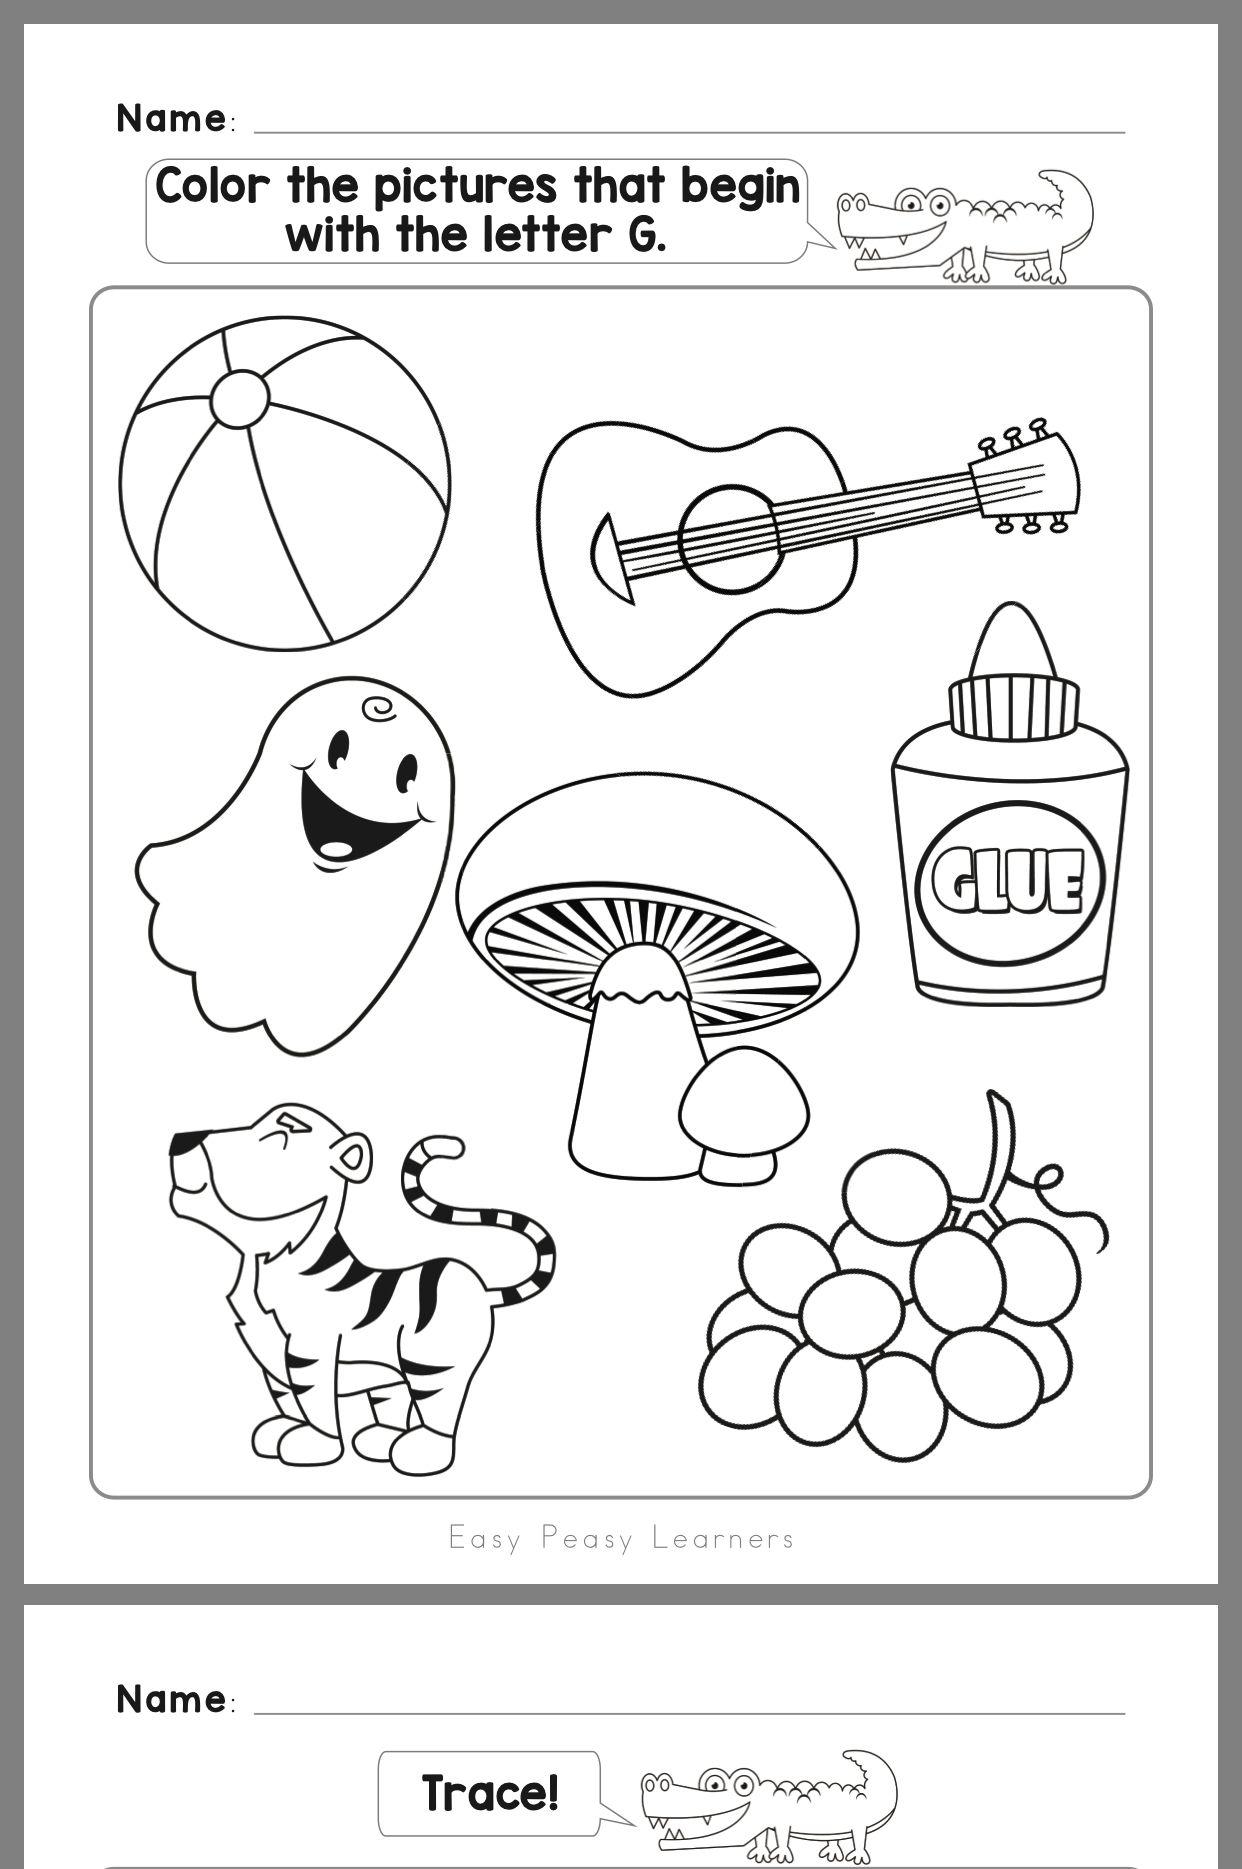 Pin By Nicolegpopovich On Quinn Homeschool Preschool Letters Letter G Worksheets Kindergarten Worksheets Printable letter g worksheets for